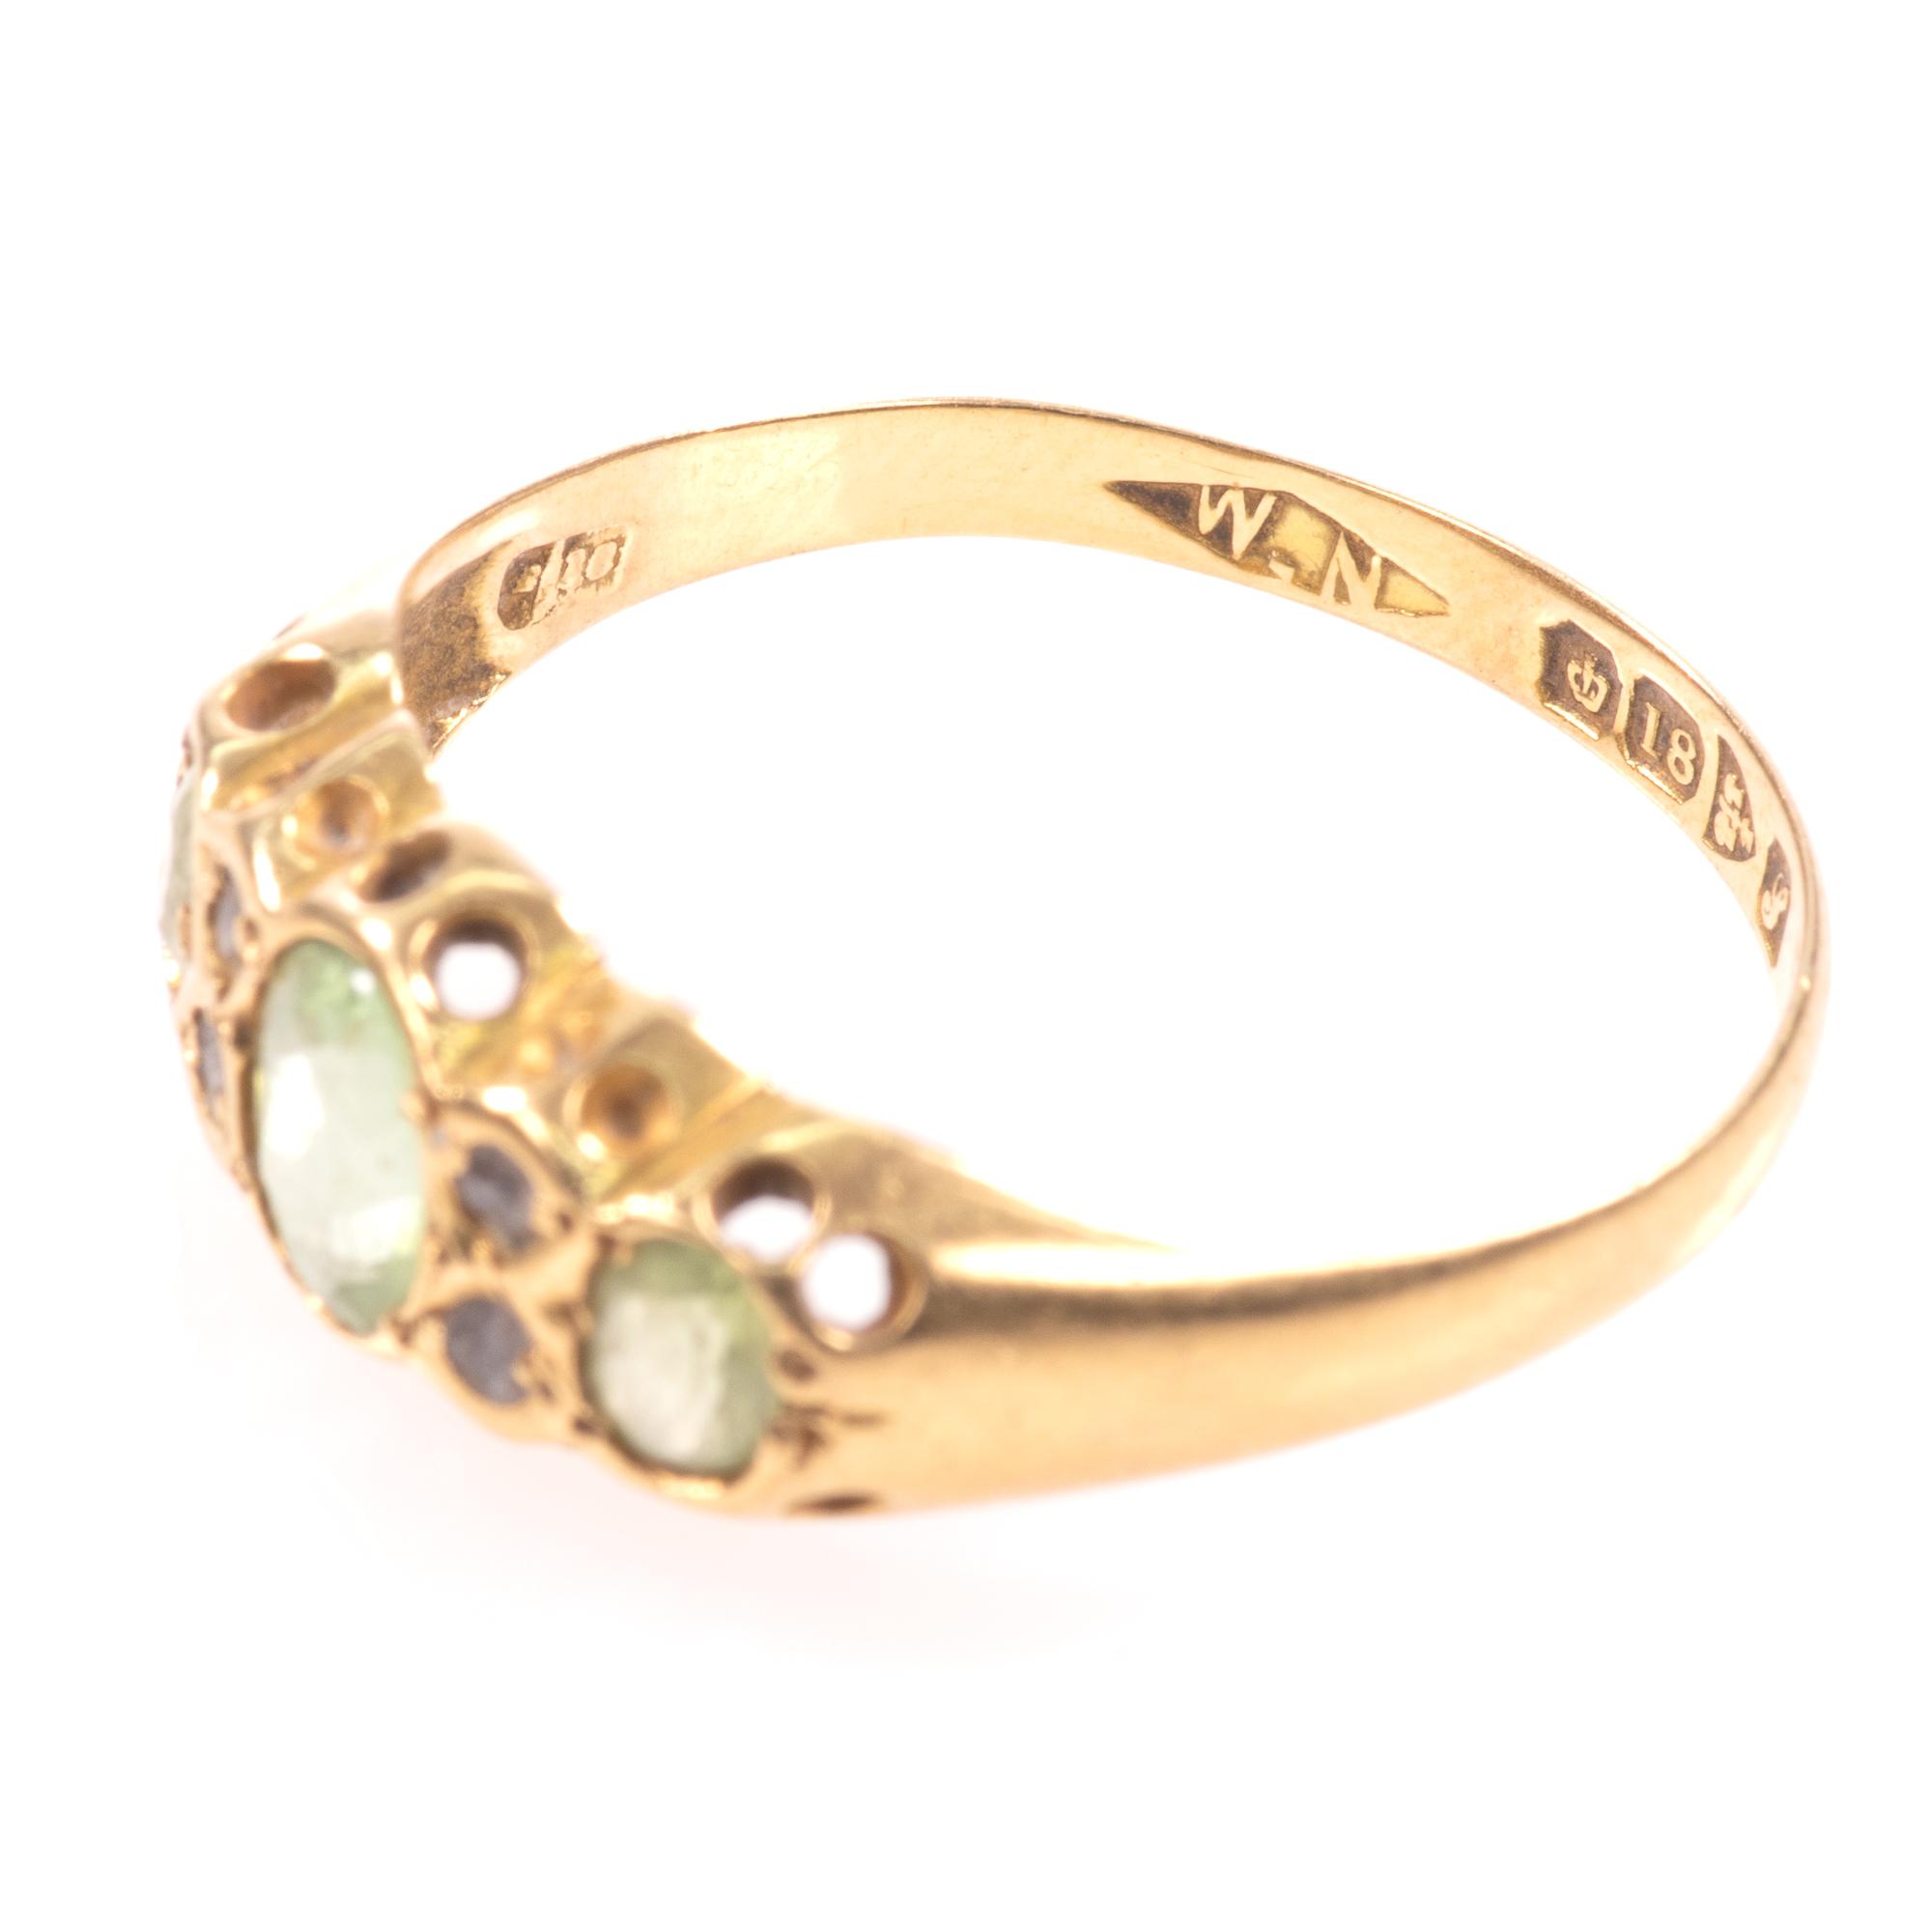 18ct Gold 0.90ct Peridot & Diamond Ring Chester 1918 - Image 5 of 8